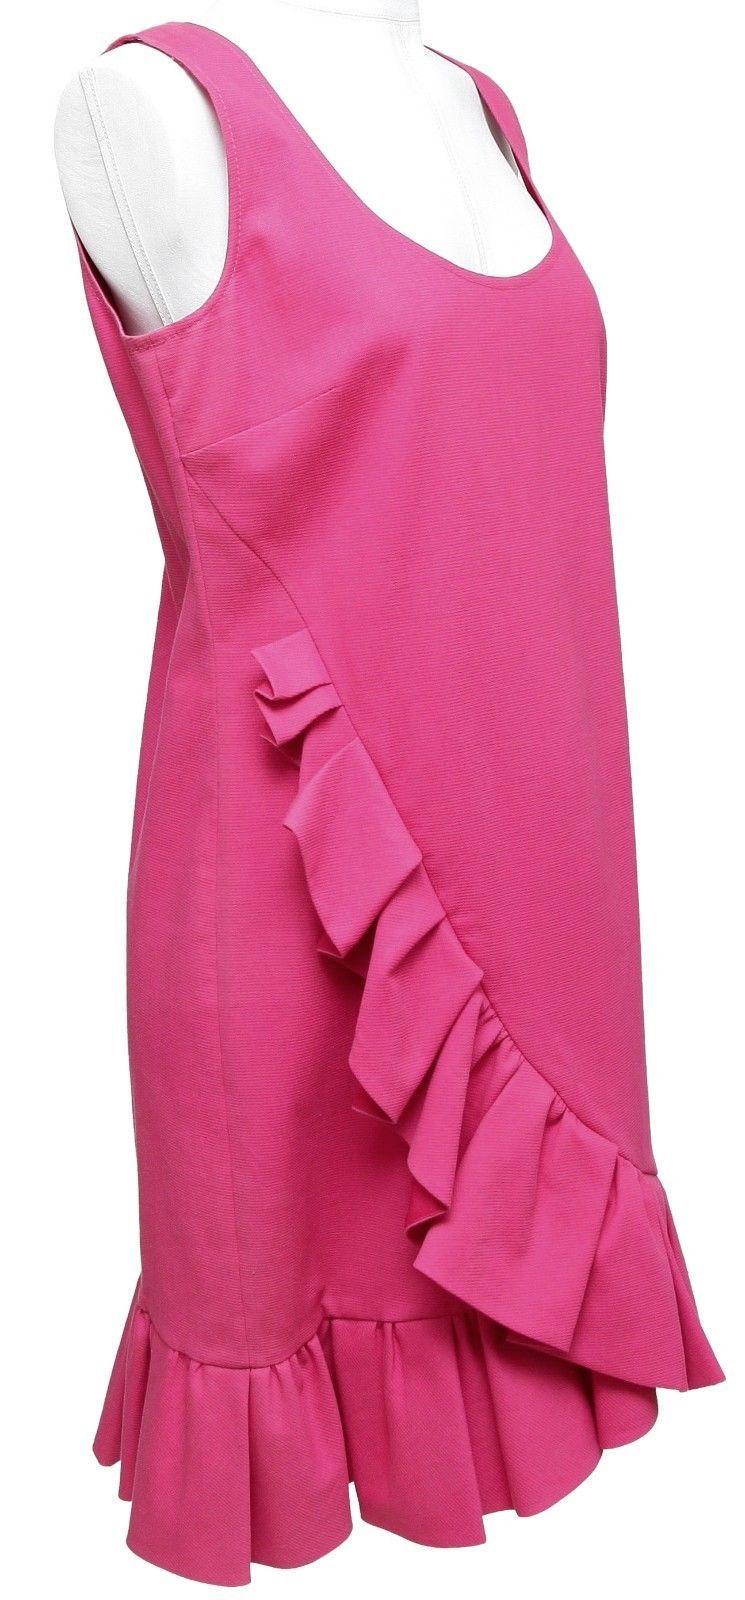 RED VALENTINO Dress Sleeveless Fuchsia Ruffle Cotton Blend